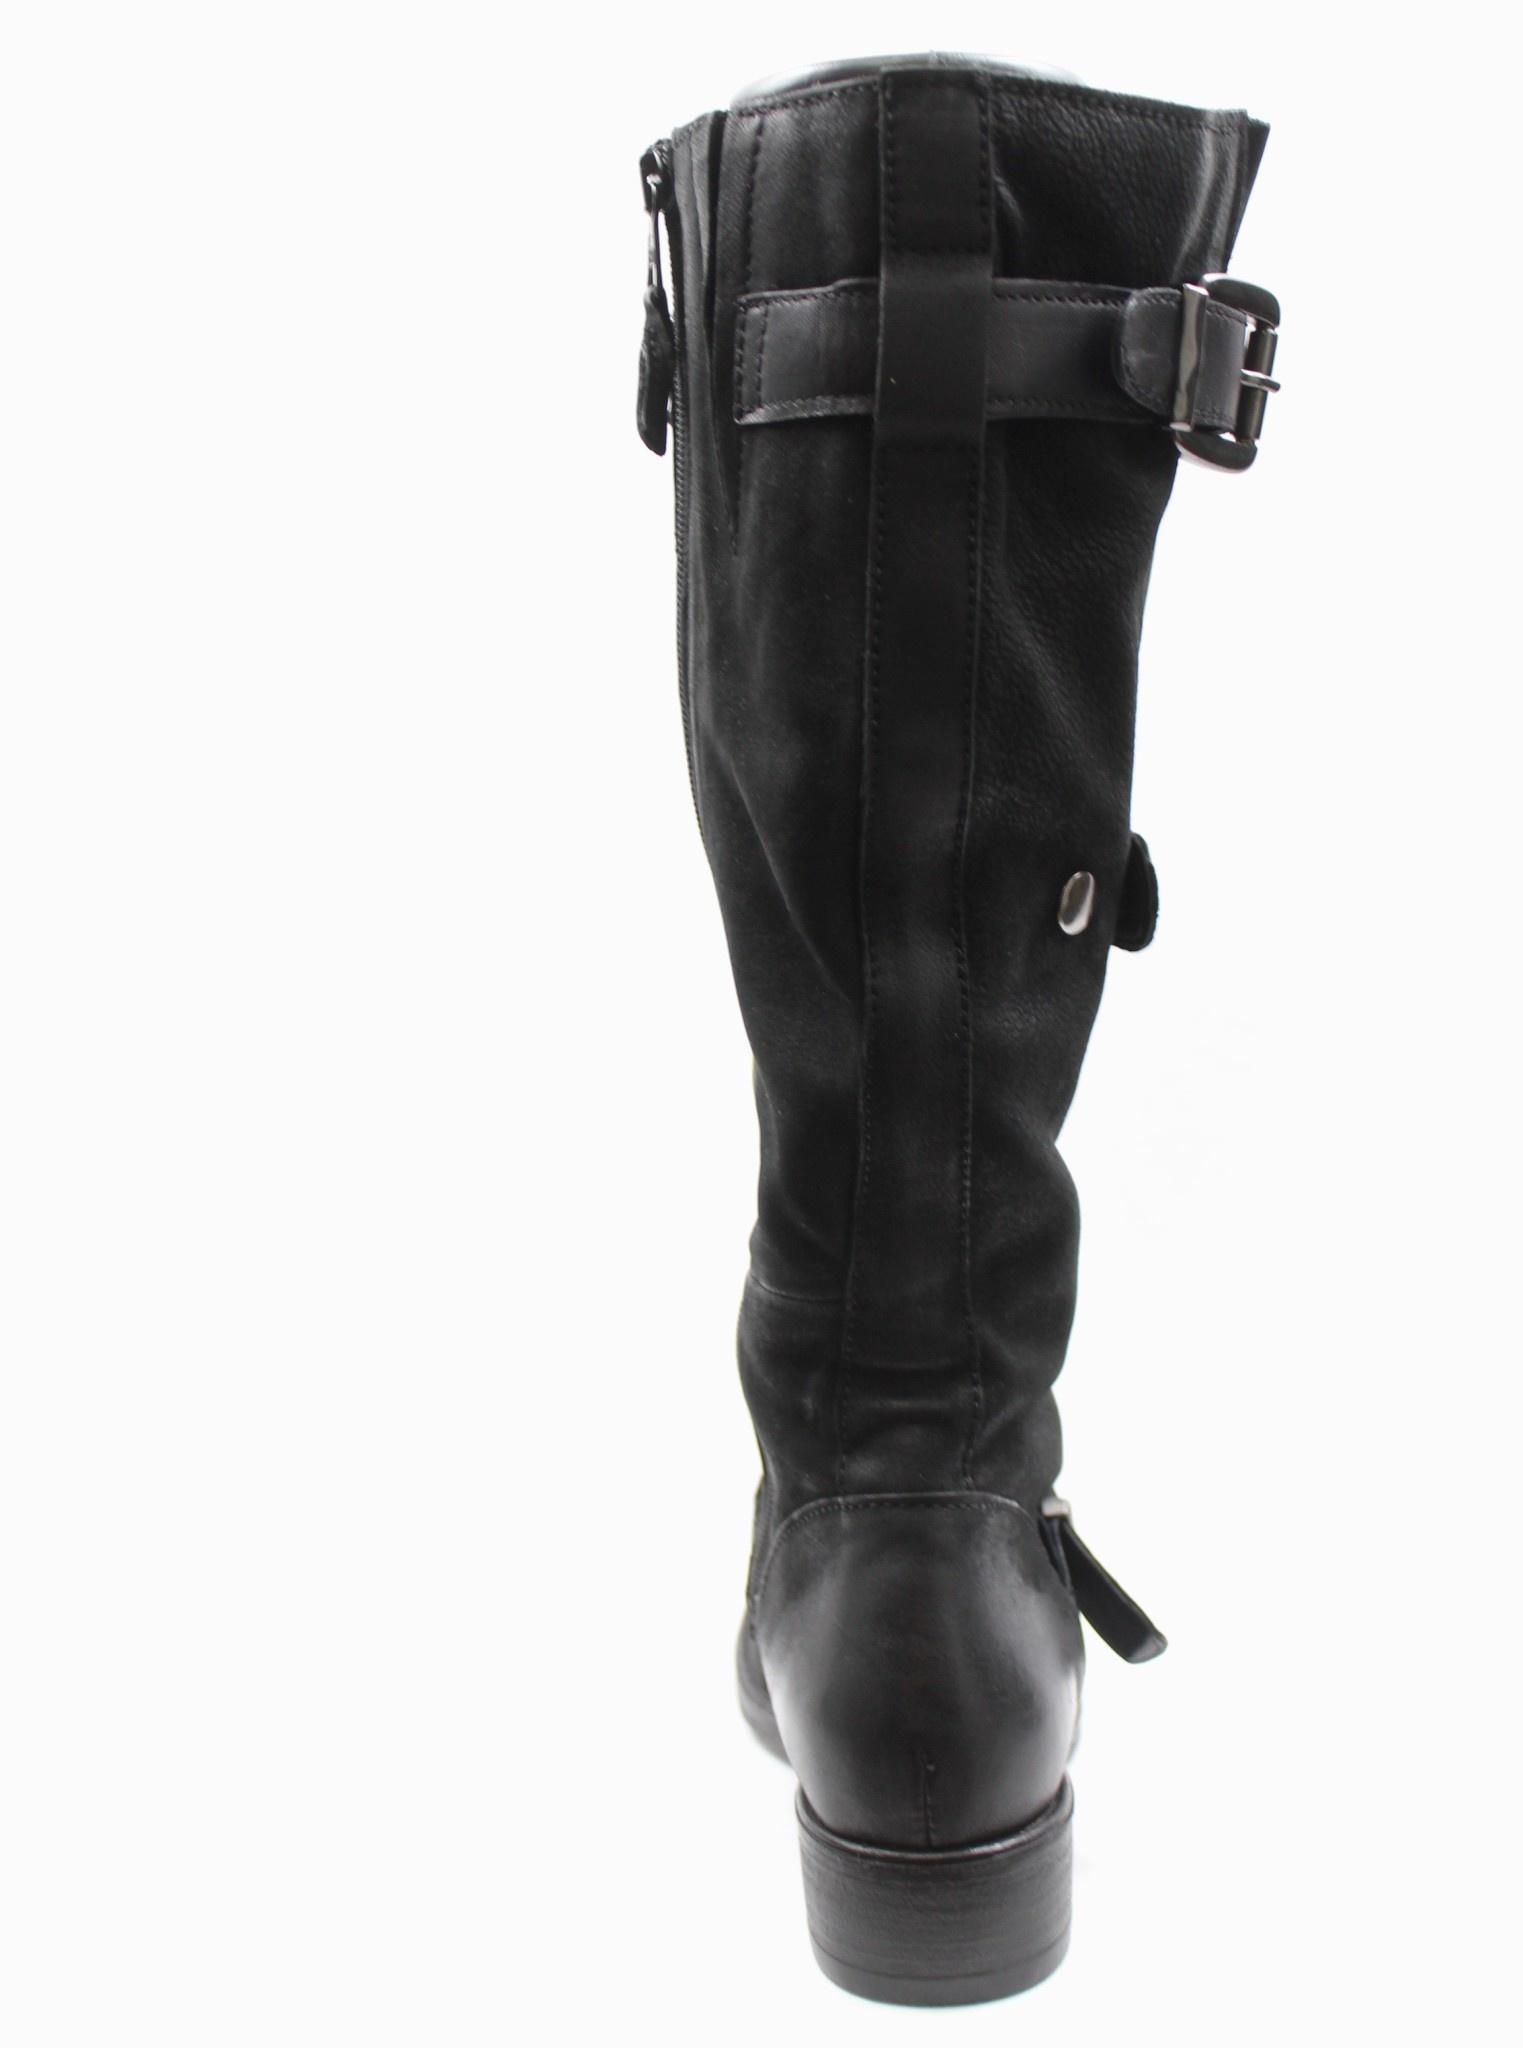 MJUS MJUS 185306 Tall Wide Calf Boot